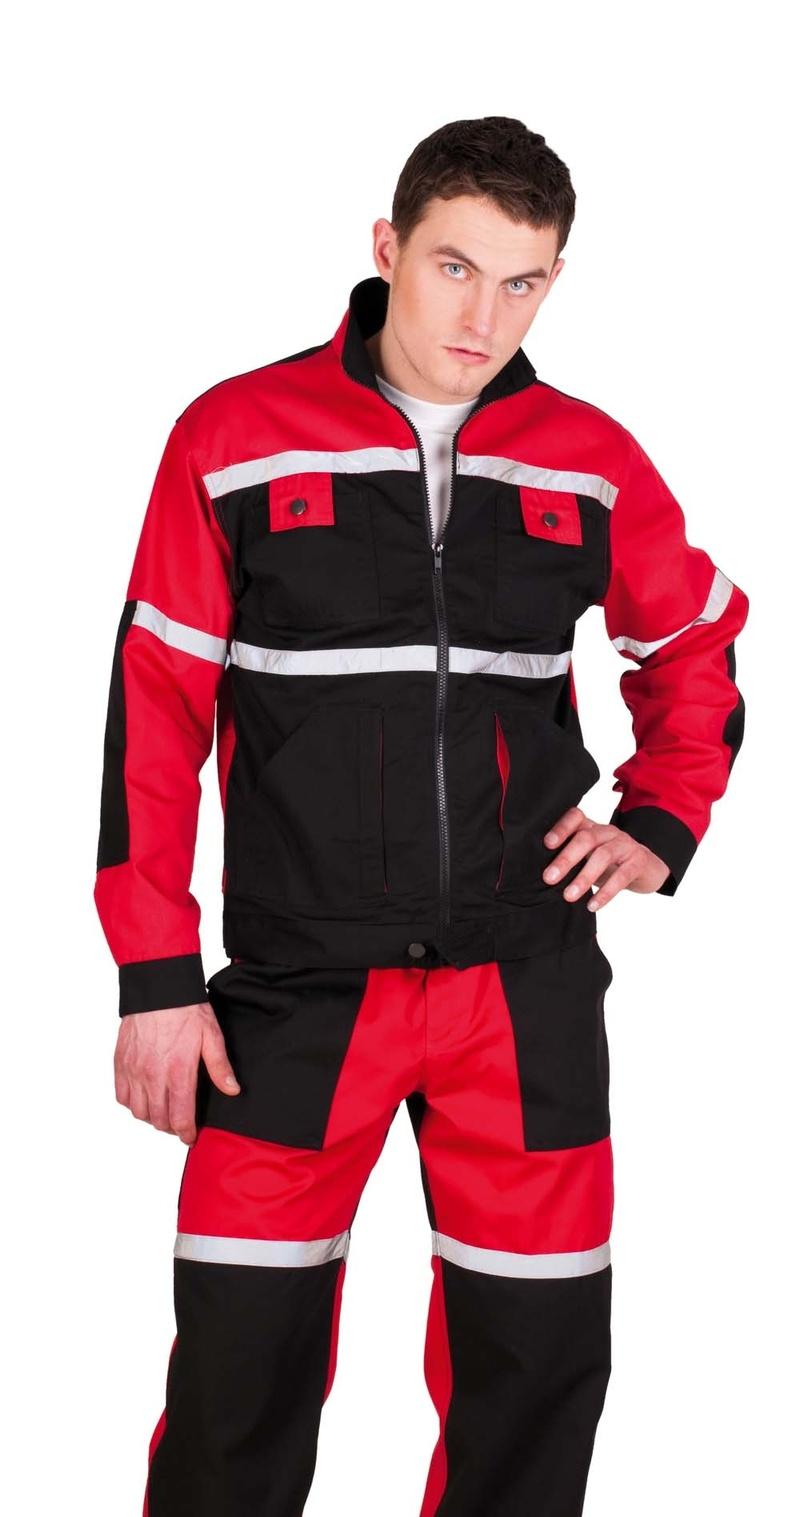 Speciální ochranné obleky - Tayra bunda